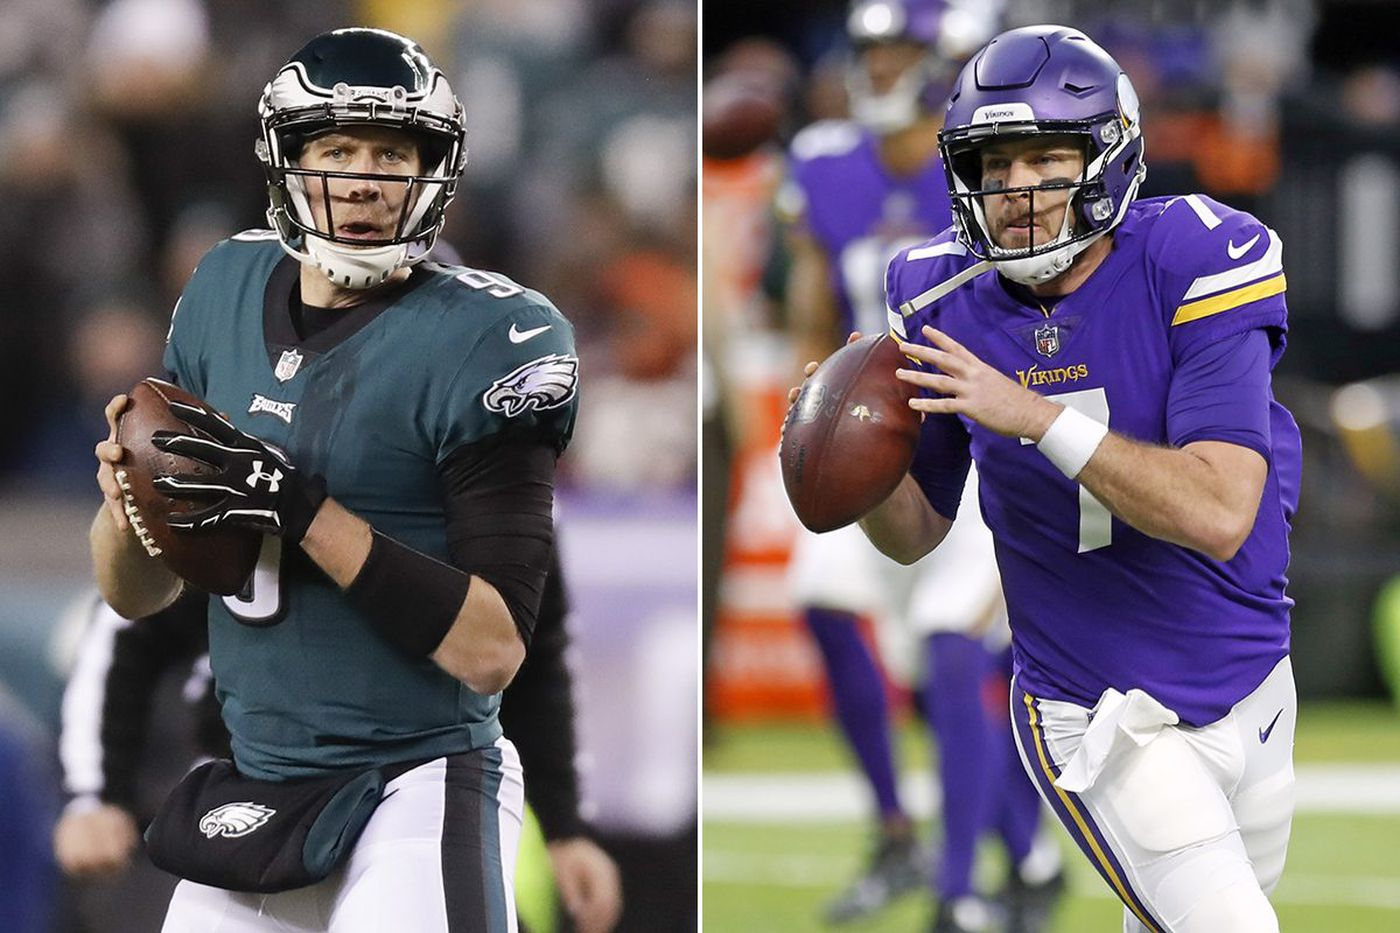 Eagles-Vikings predictions: Beat writers are split